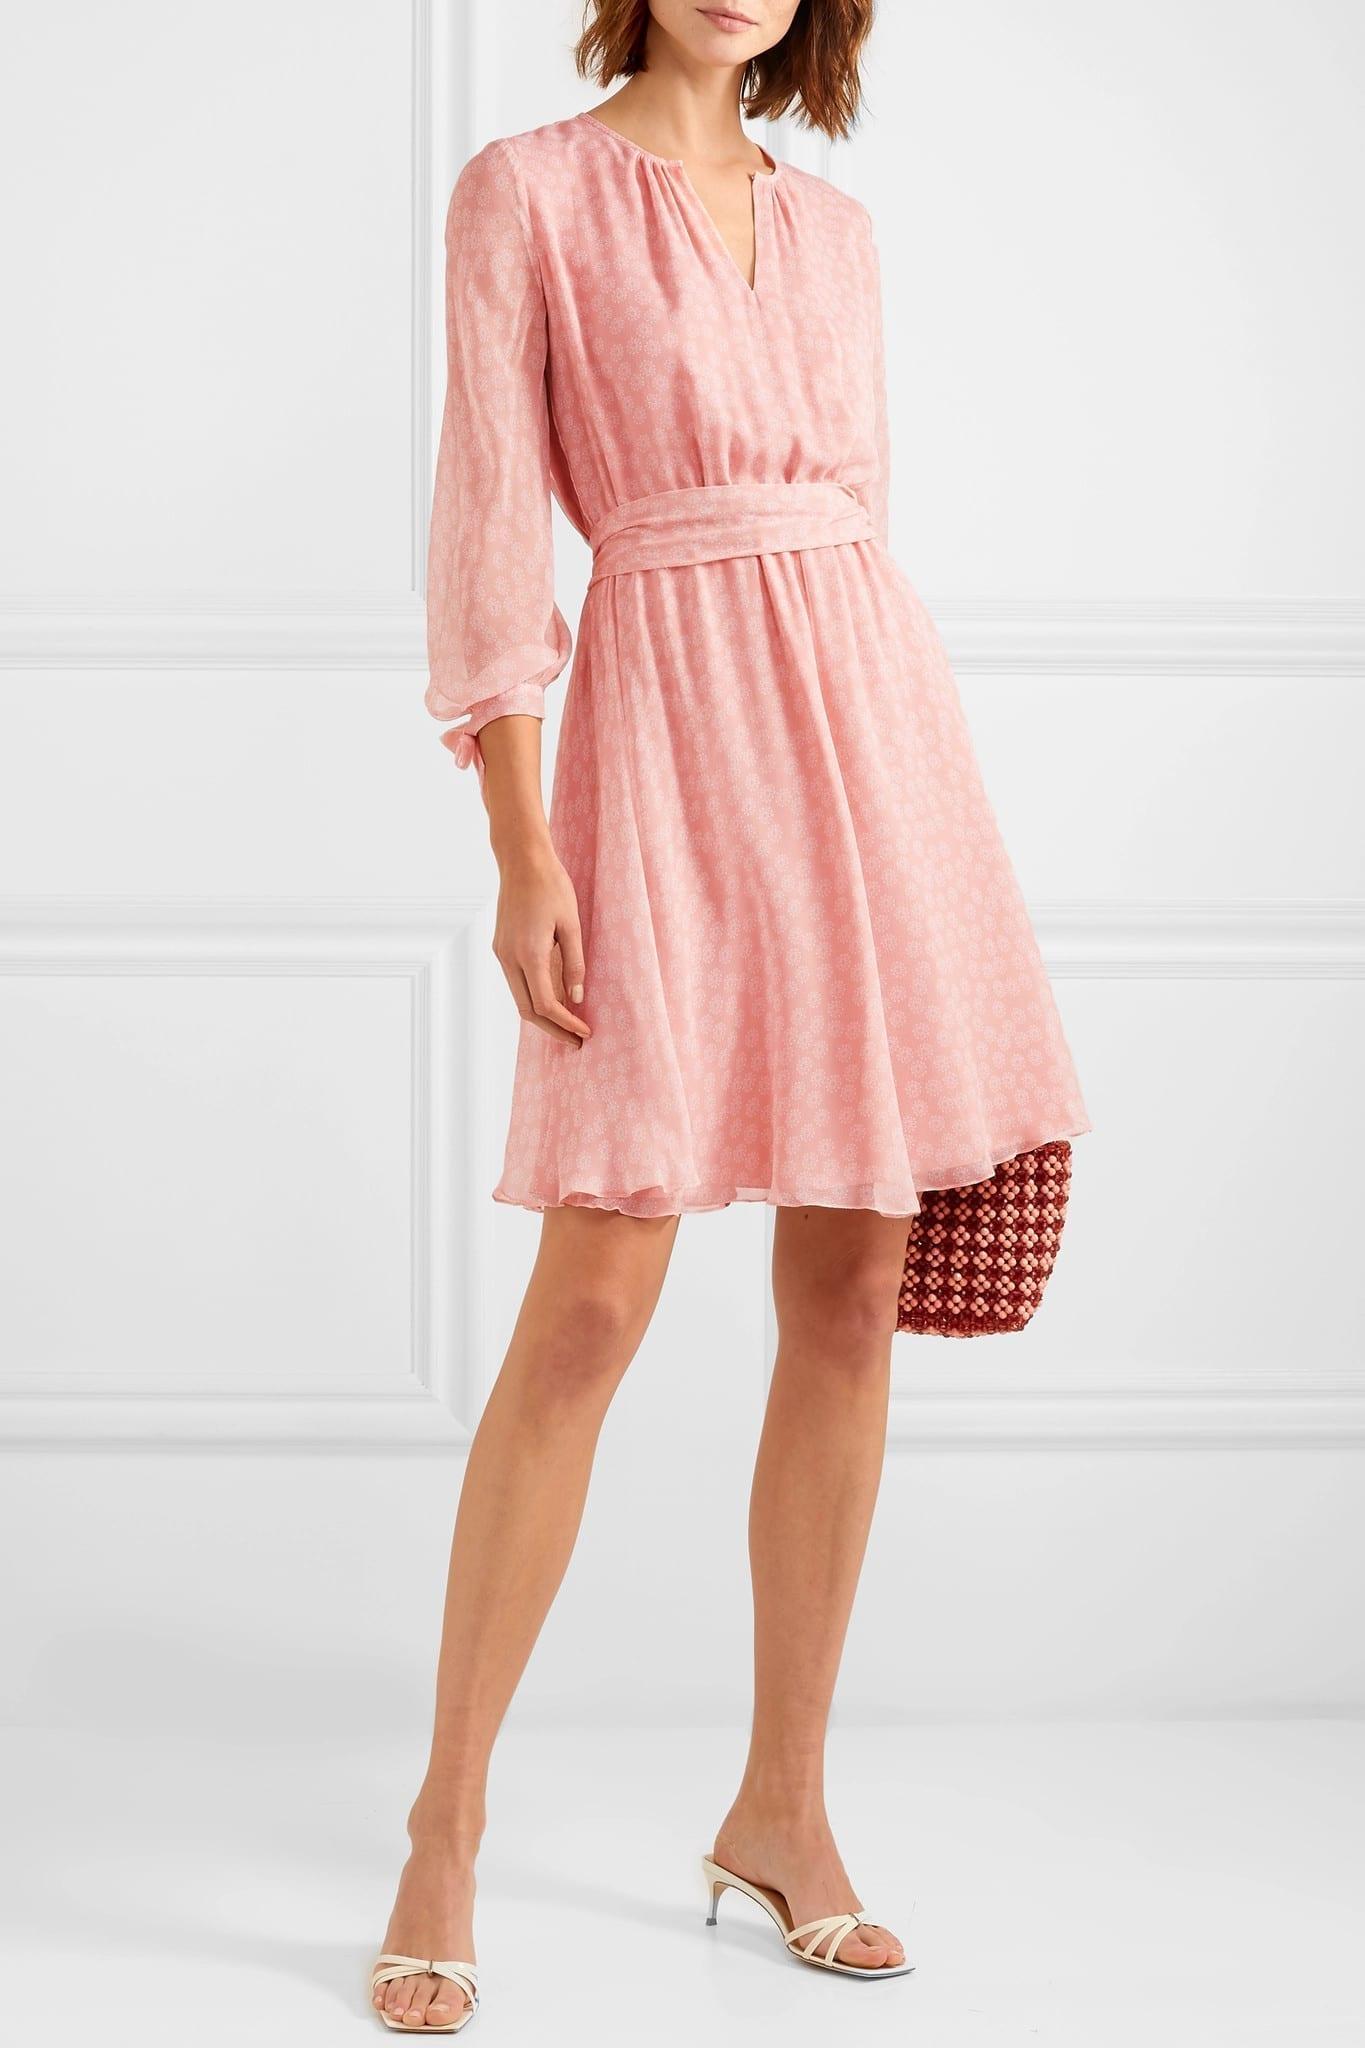 d8e1cd014 AROSS GIRL X SOLER Amanda Belted Floral-Print Silk-Georgette Mini Pink Dress